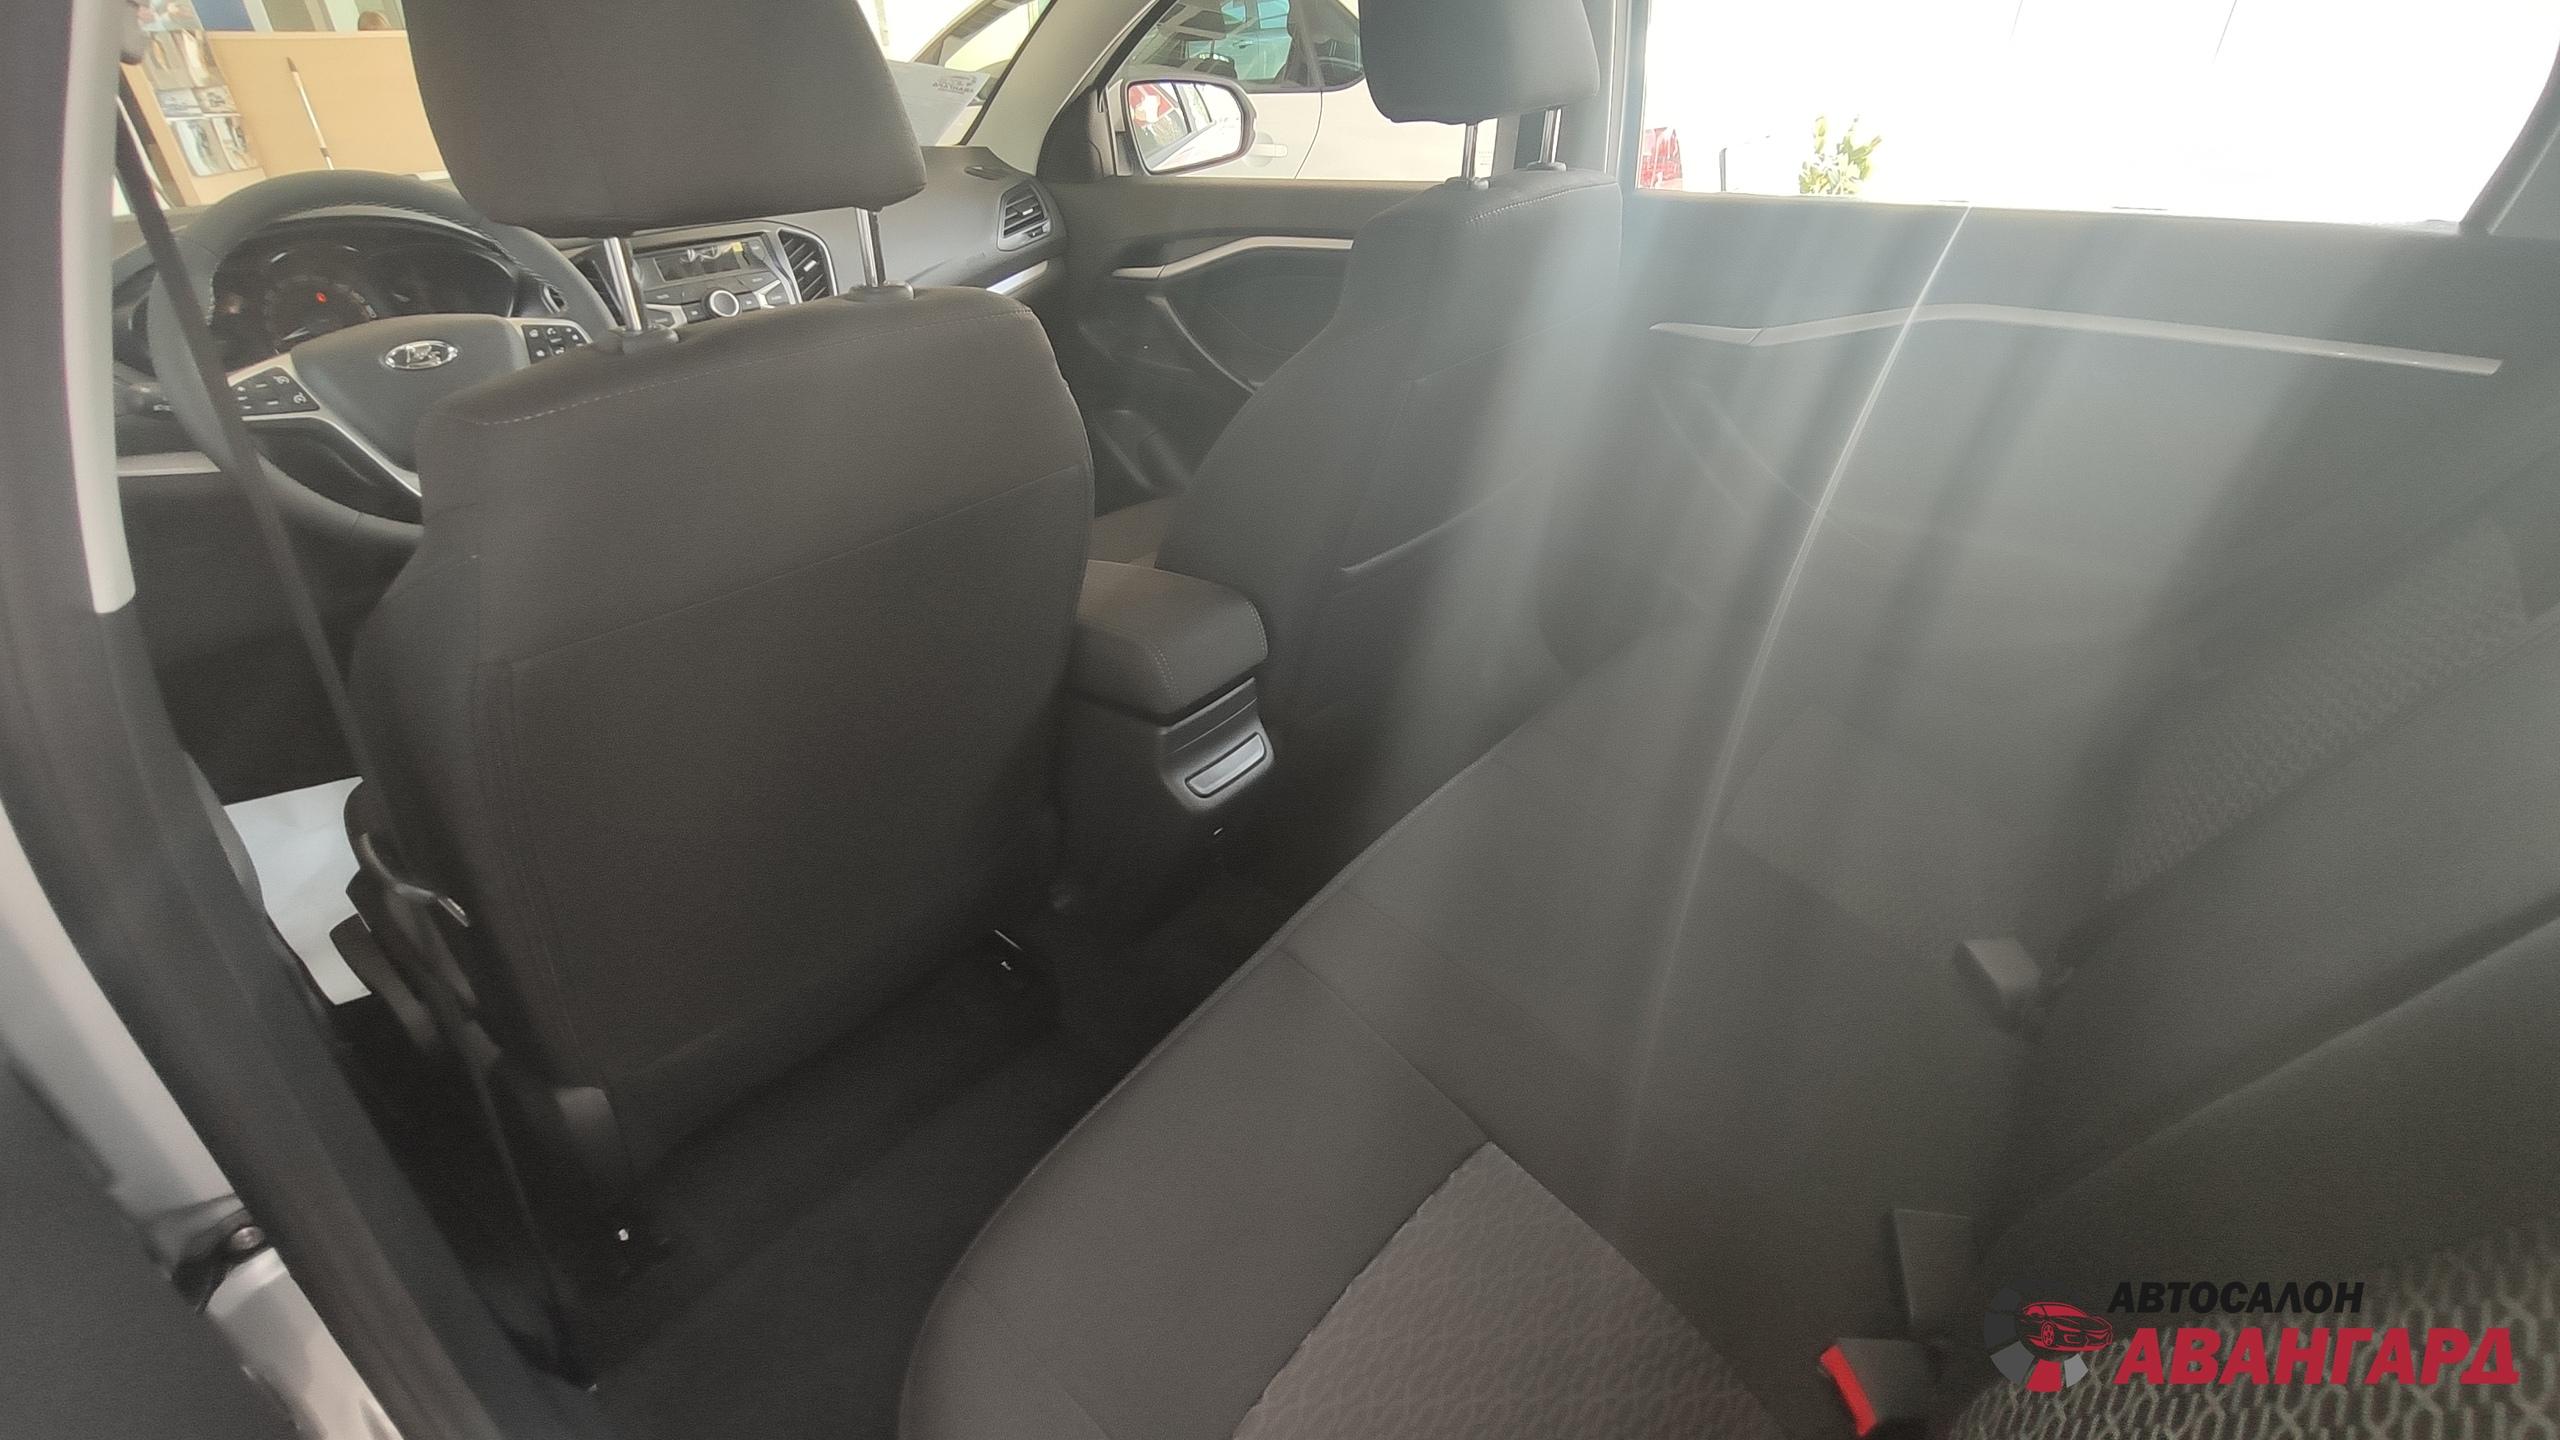 Lada Vesta SW (Лада Веста СВ) Универсал 1.6 л 16-кл. (106 л.с.), 5МТ / Comfort / Winter 2020